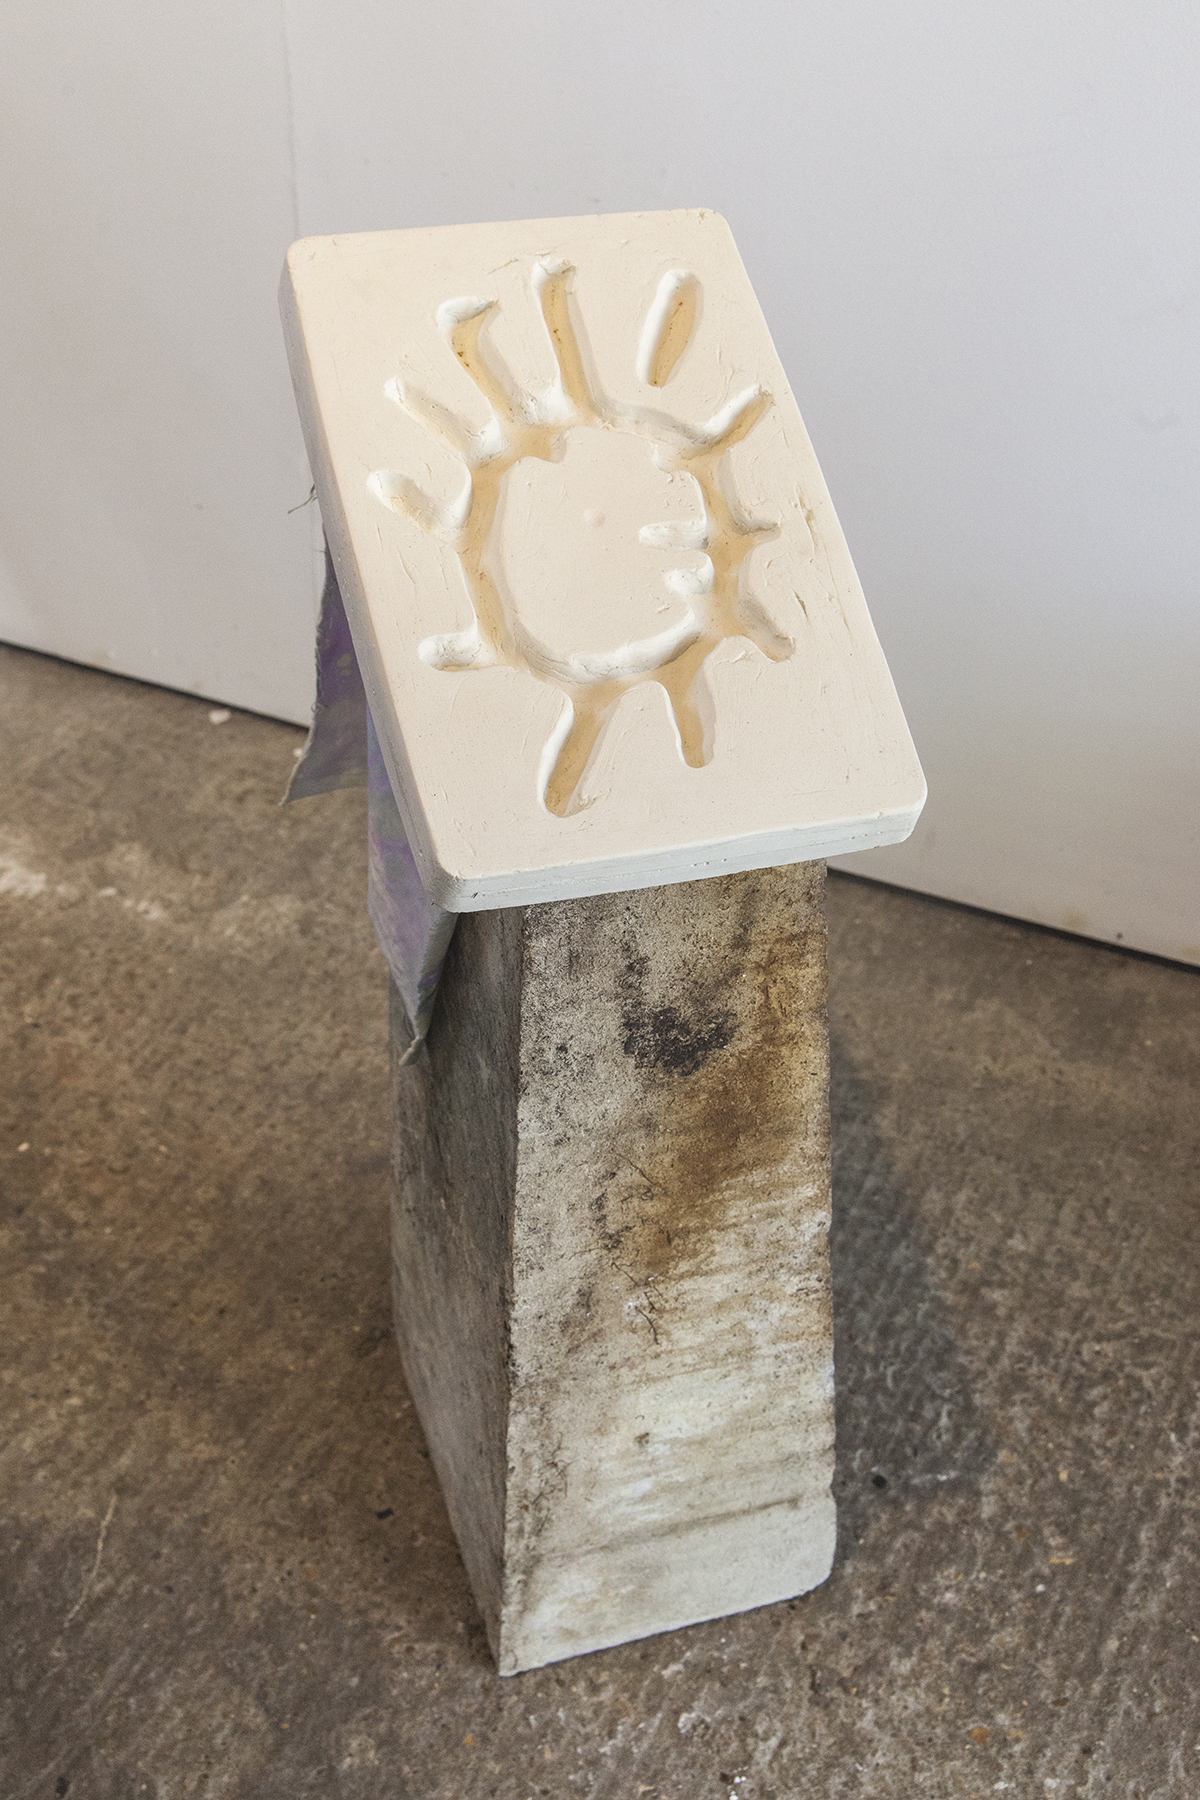 Sun / Shade Salt Cave — Found concrete, plaster, dyed cotton, 2019.